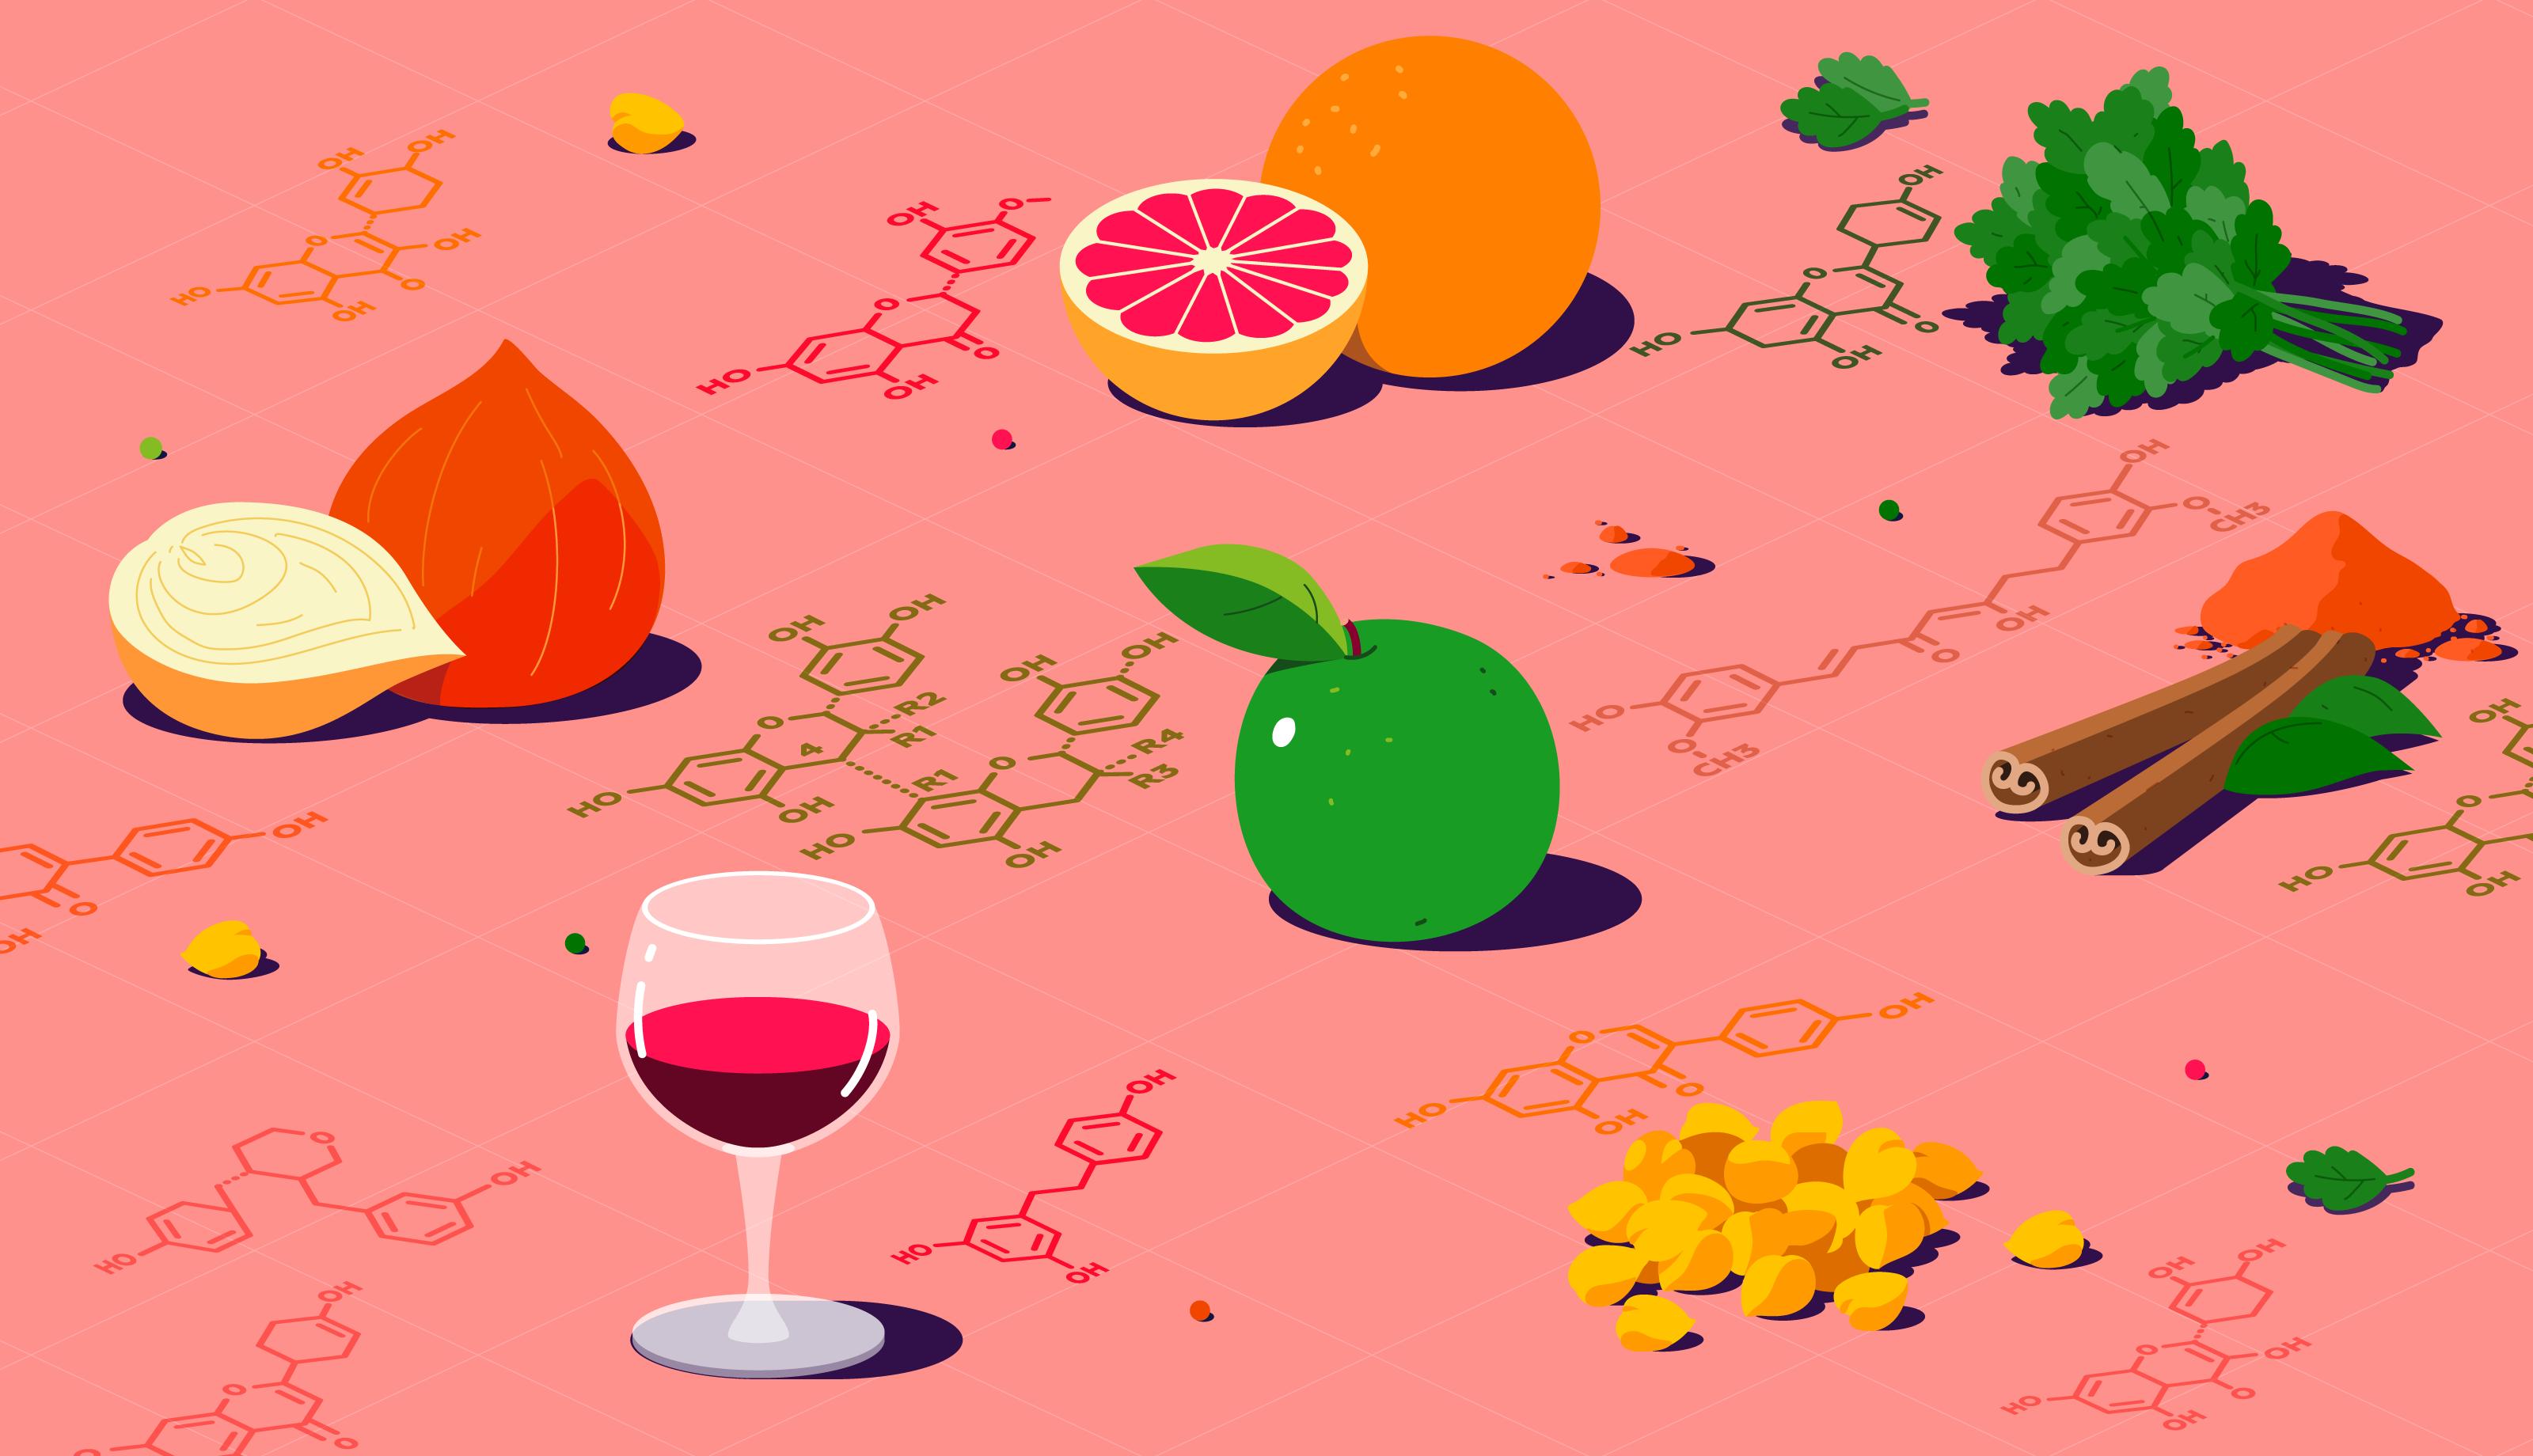 2019-10-09-Polyphenols-and-health-1